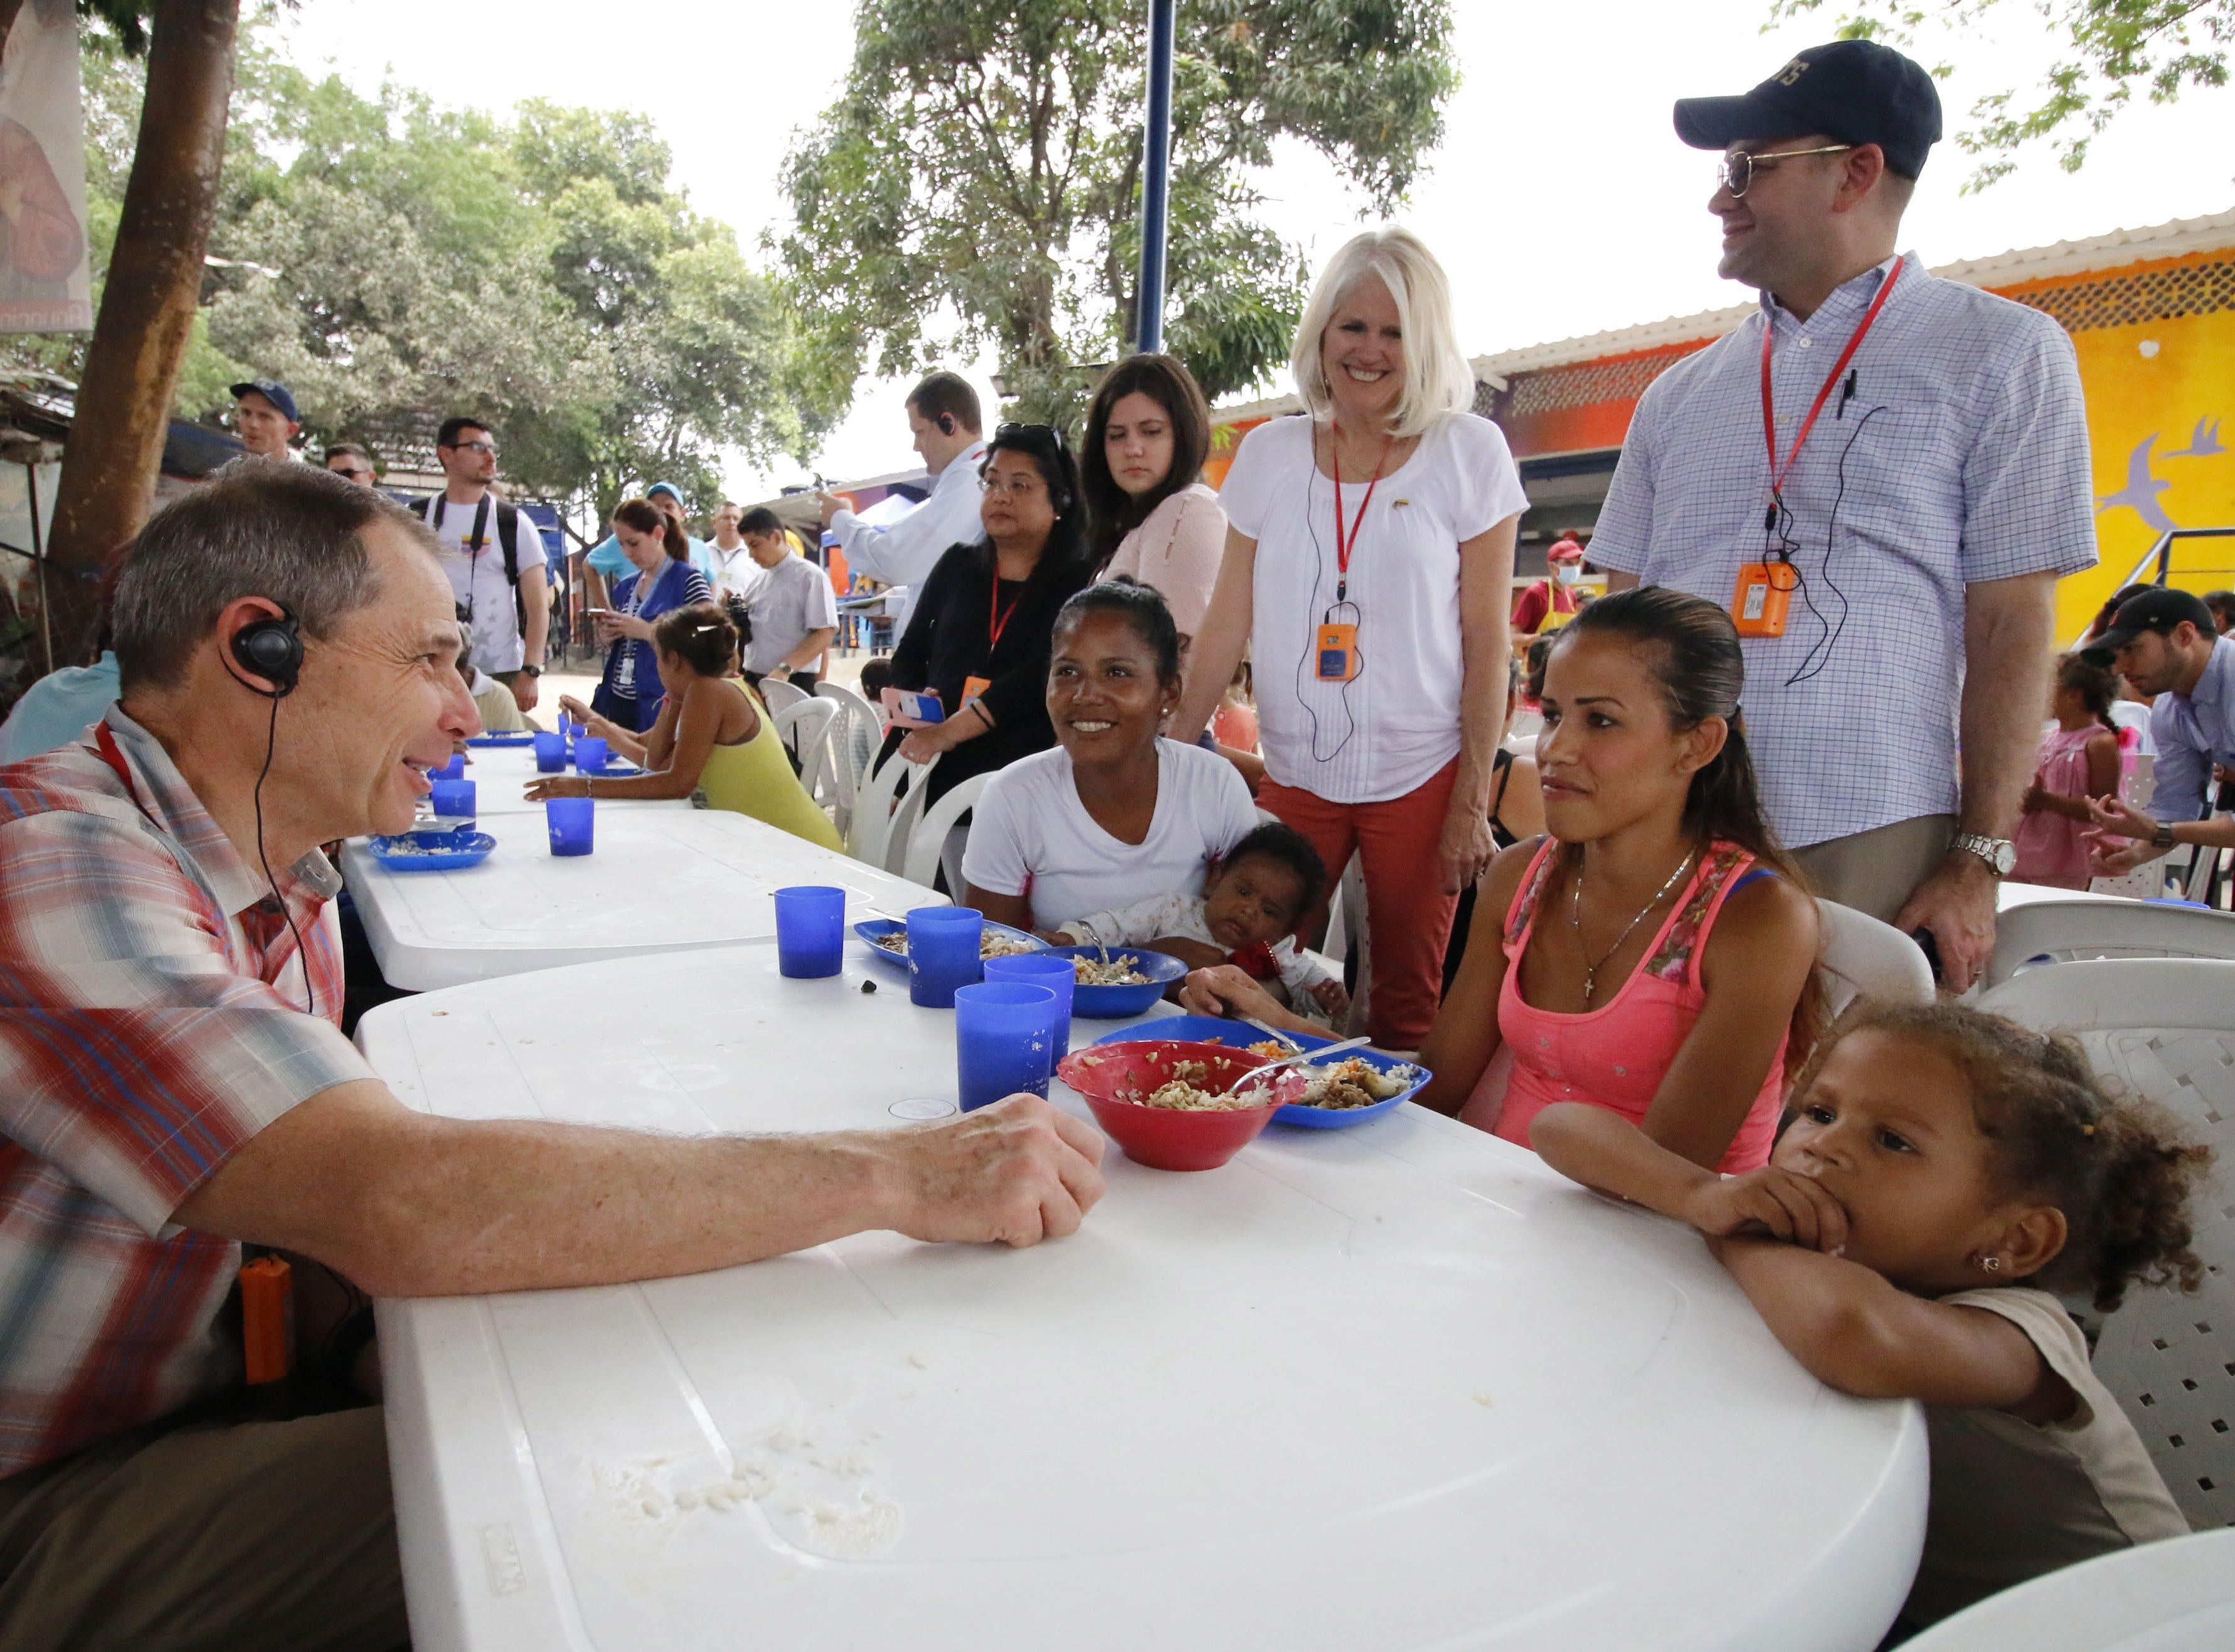 US Senator John Curtis, left, converses with a Venezuelan family during a visit of several US senators to the Simon Bolivar international bridge, on the border between Venezuela and Cucuta, Colombia on March 29, 2019.